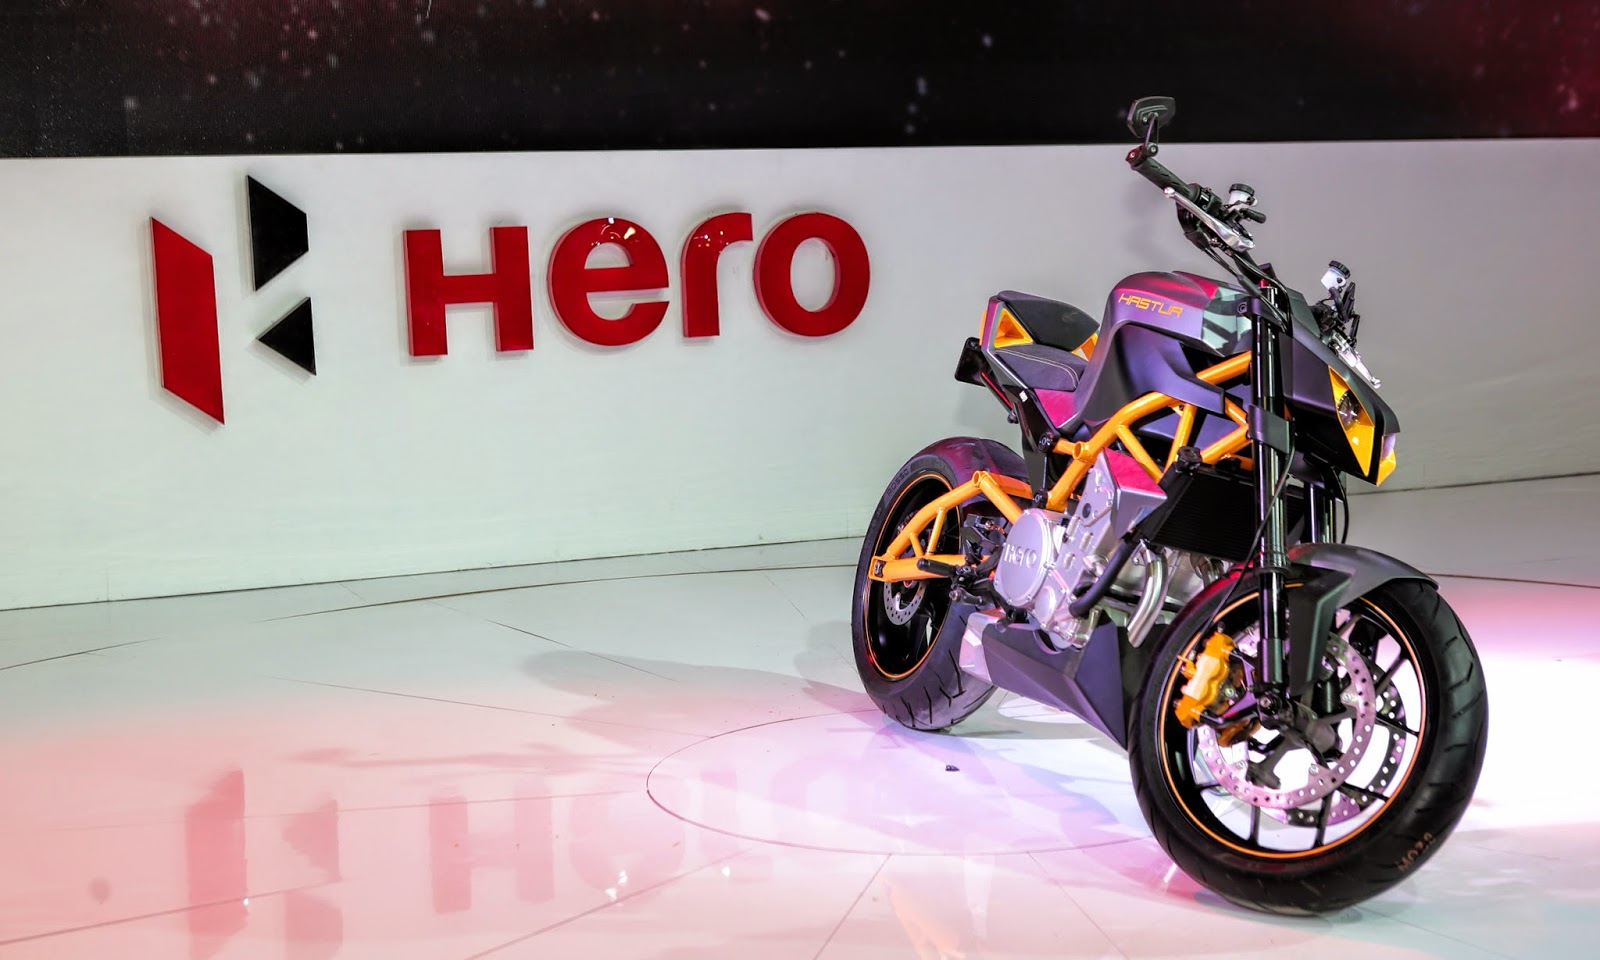 Hero Hastur Super Bike HD Wallpapers | HD Wallpapers (High ...